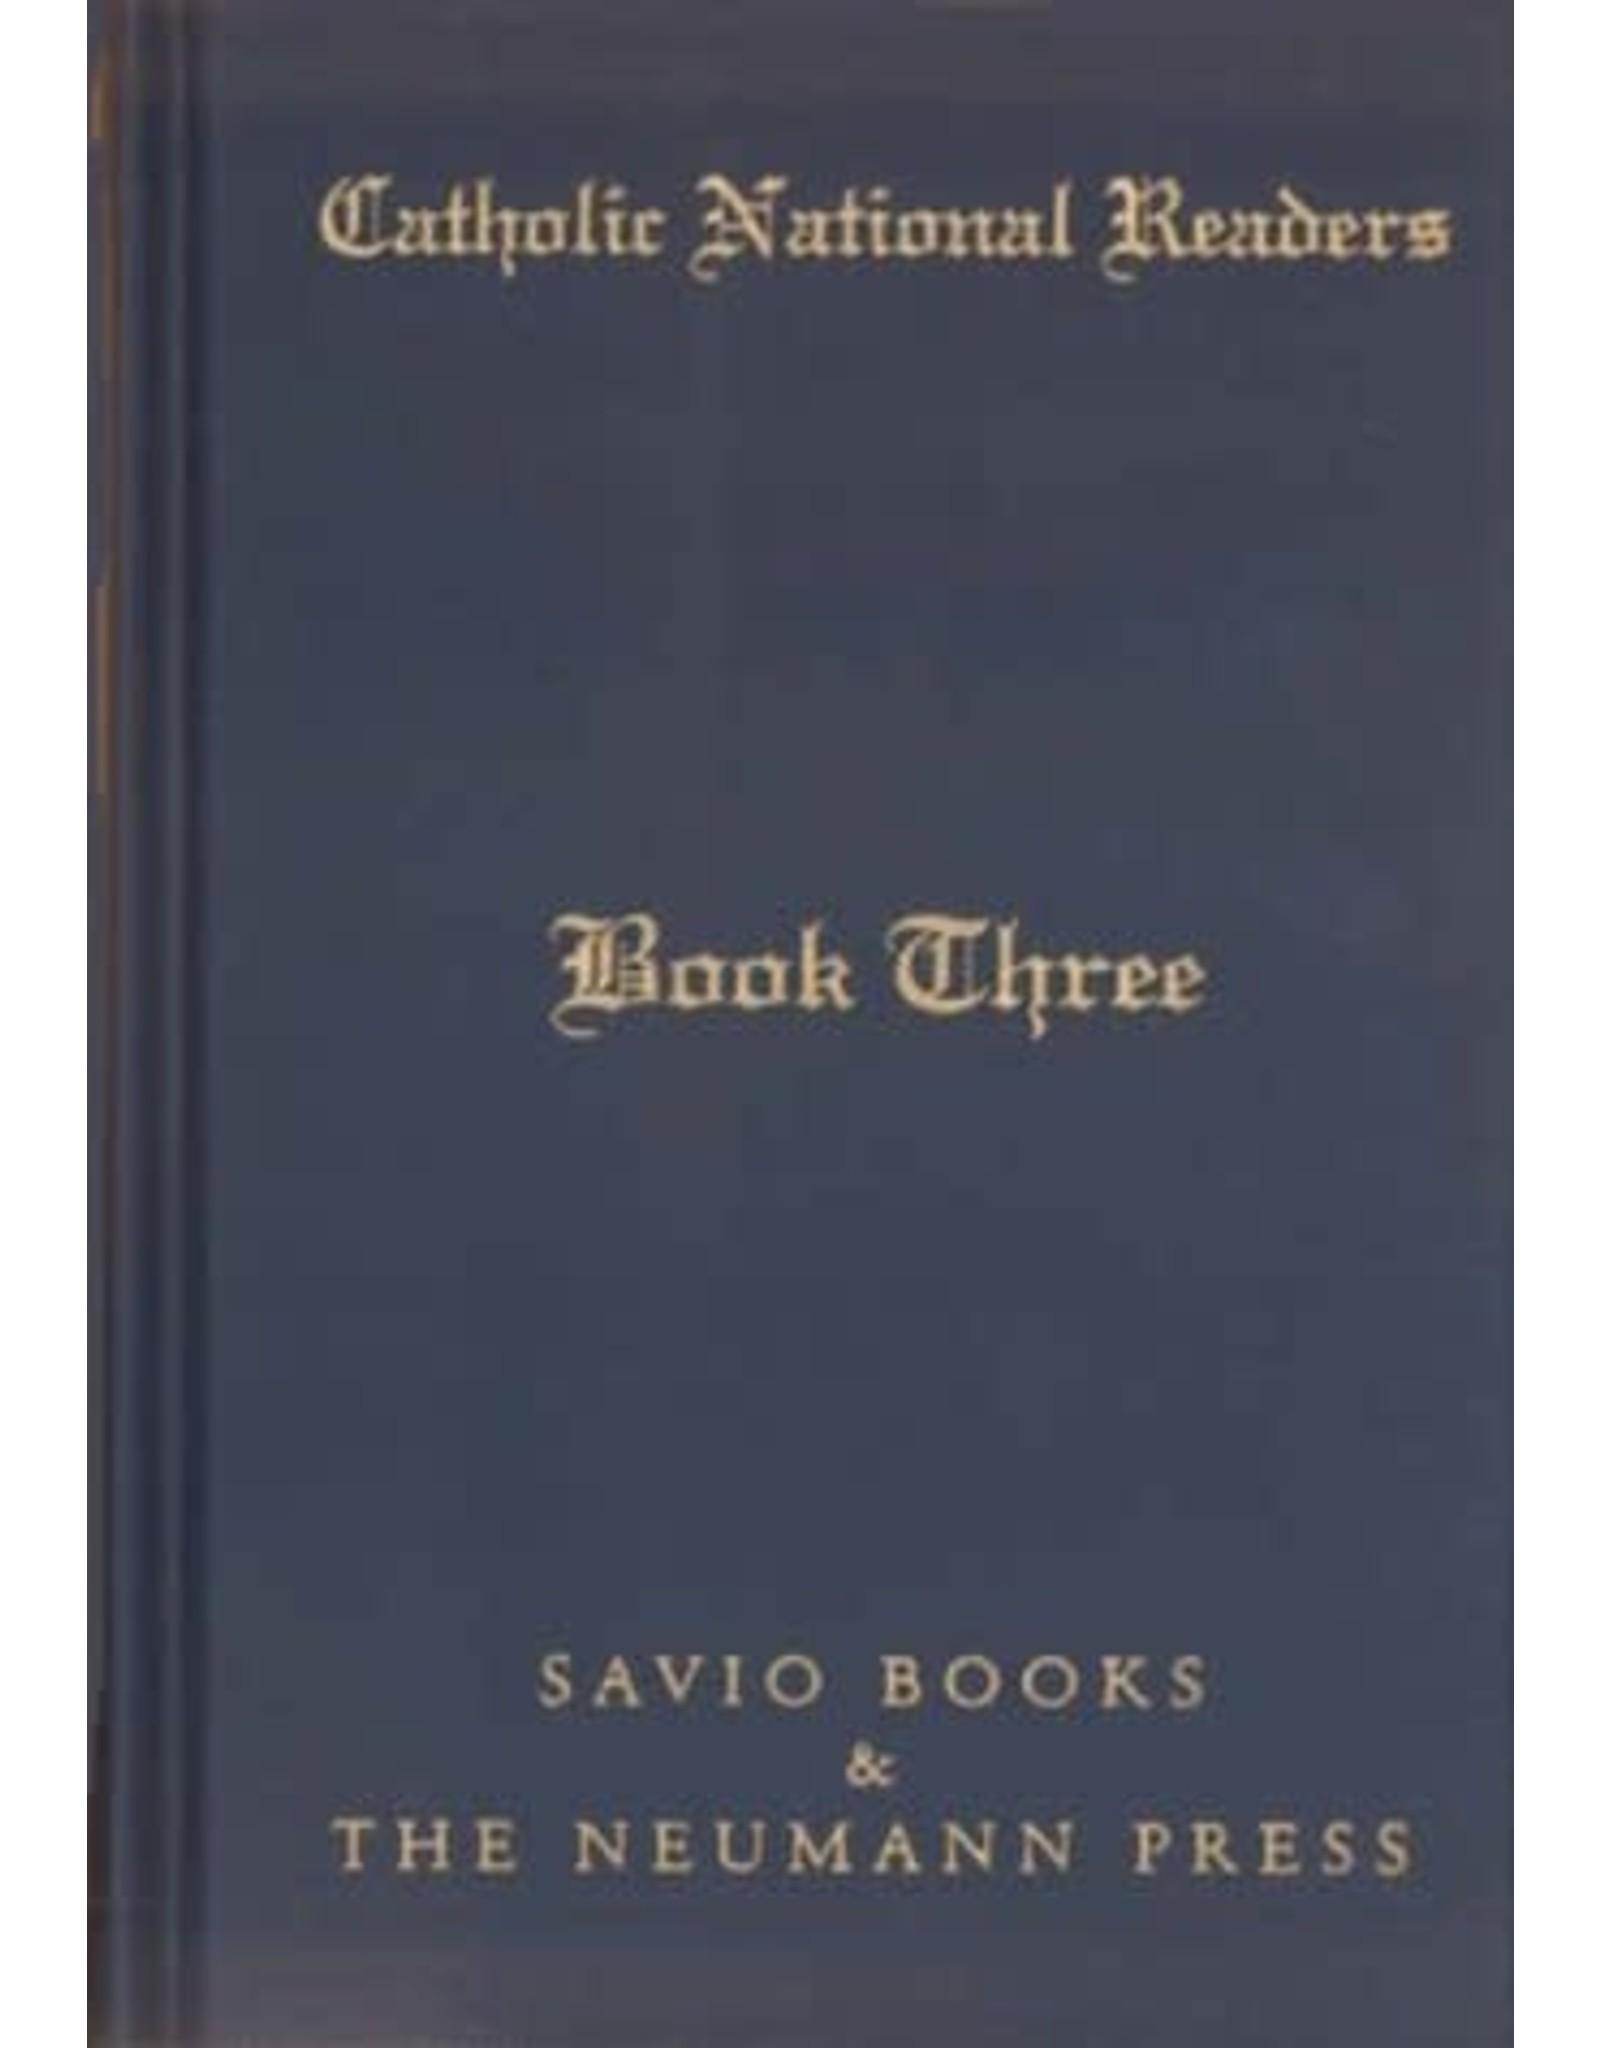 Neumann Press Catholic National Readers: Book Three (Hardcover)